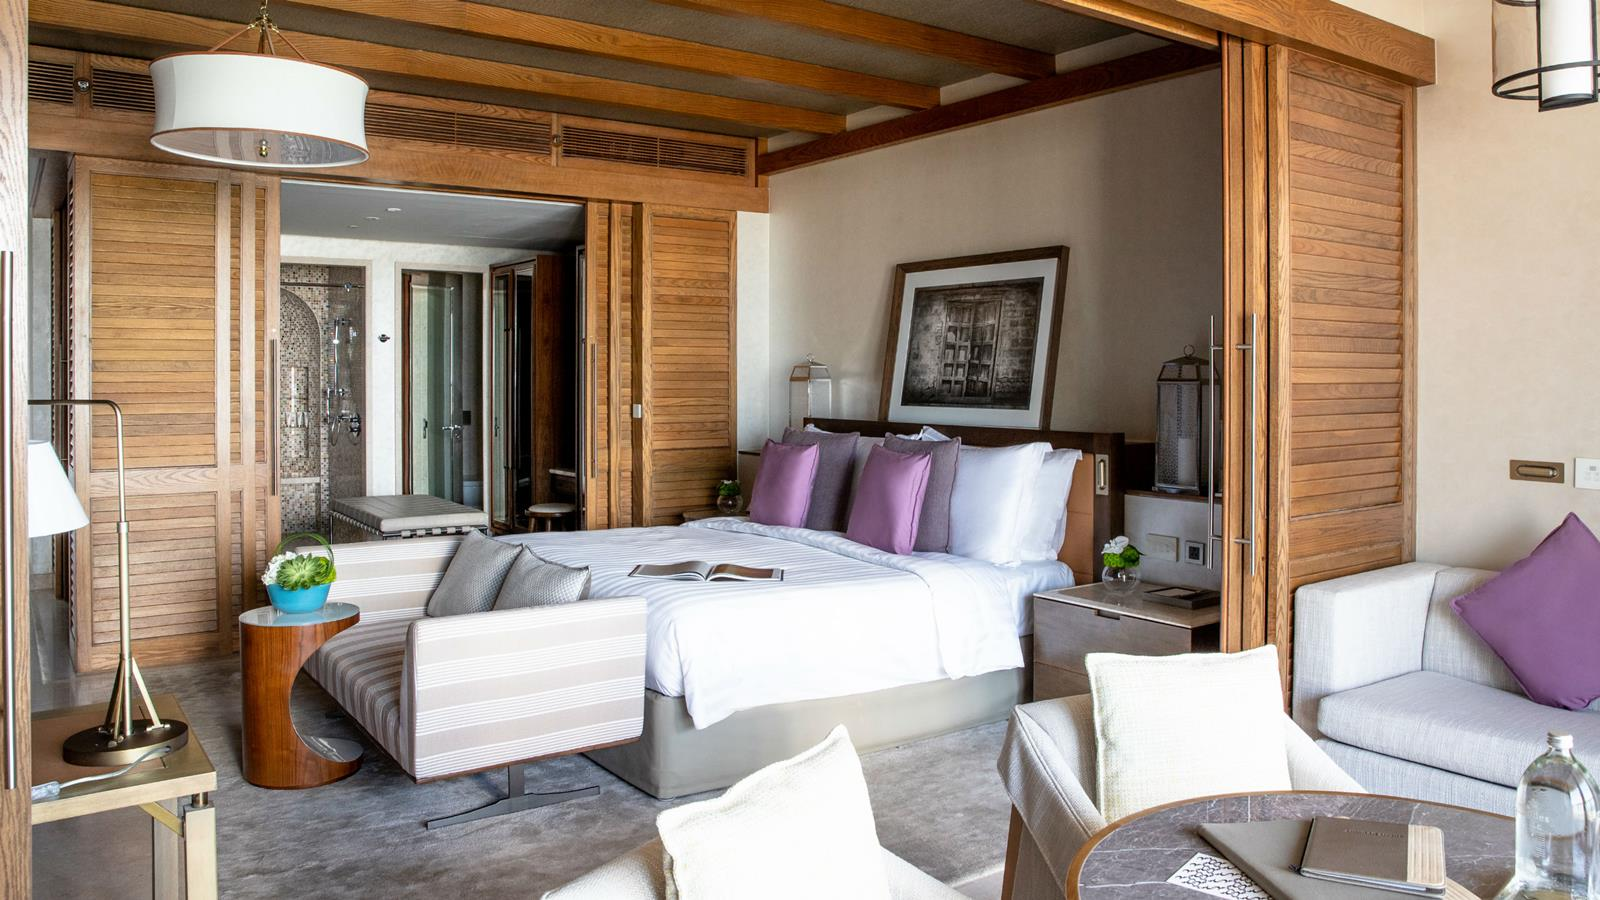 jumeirah-al-naseem-ocean-resort-superior-bedroom3-hero.jpg